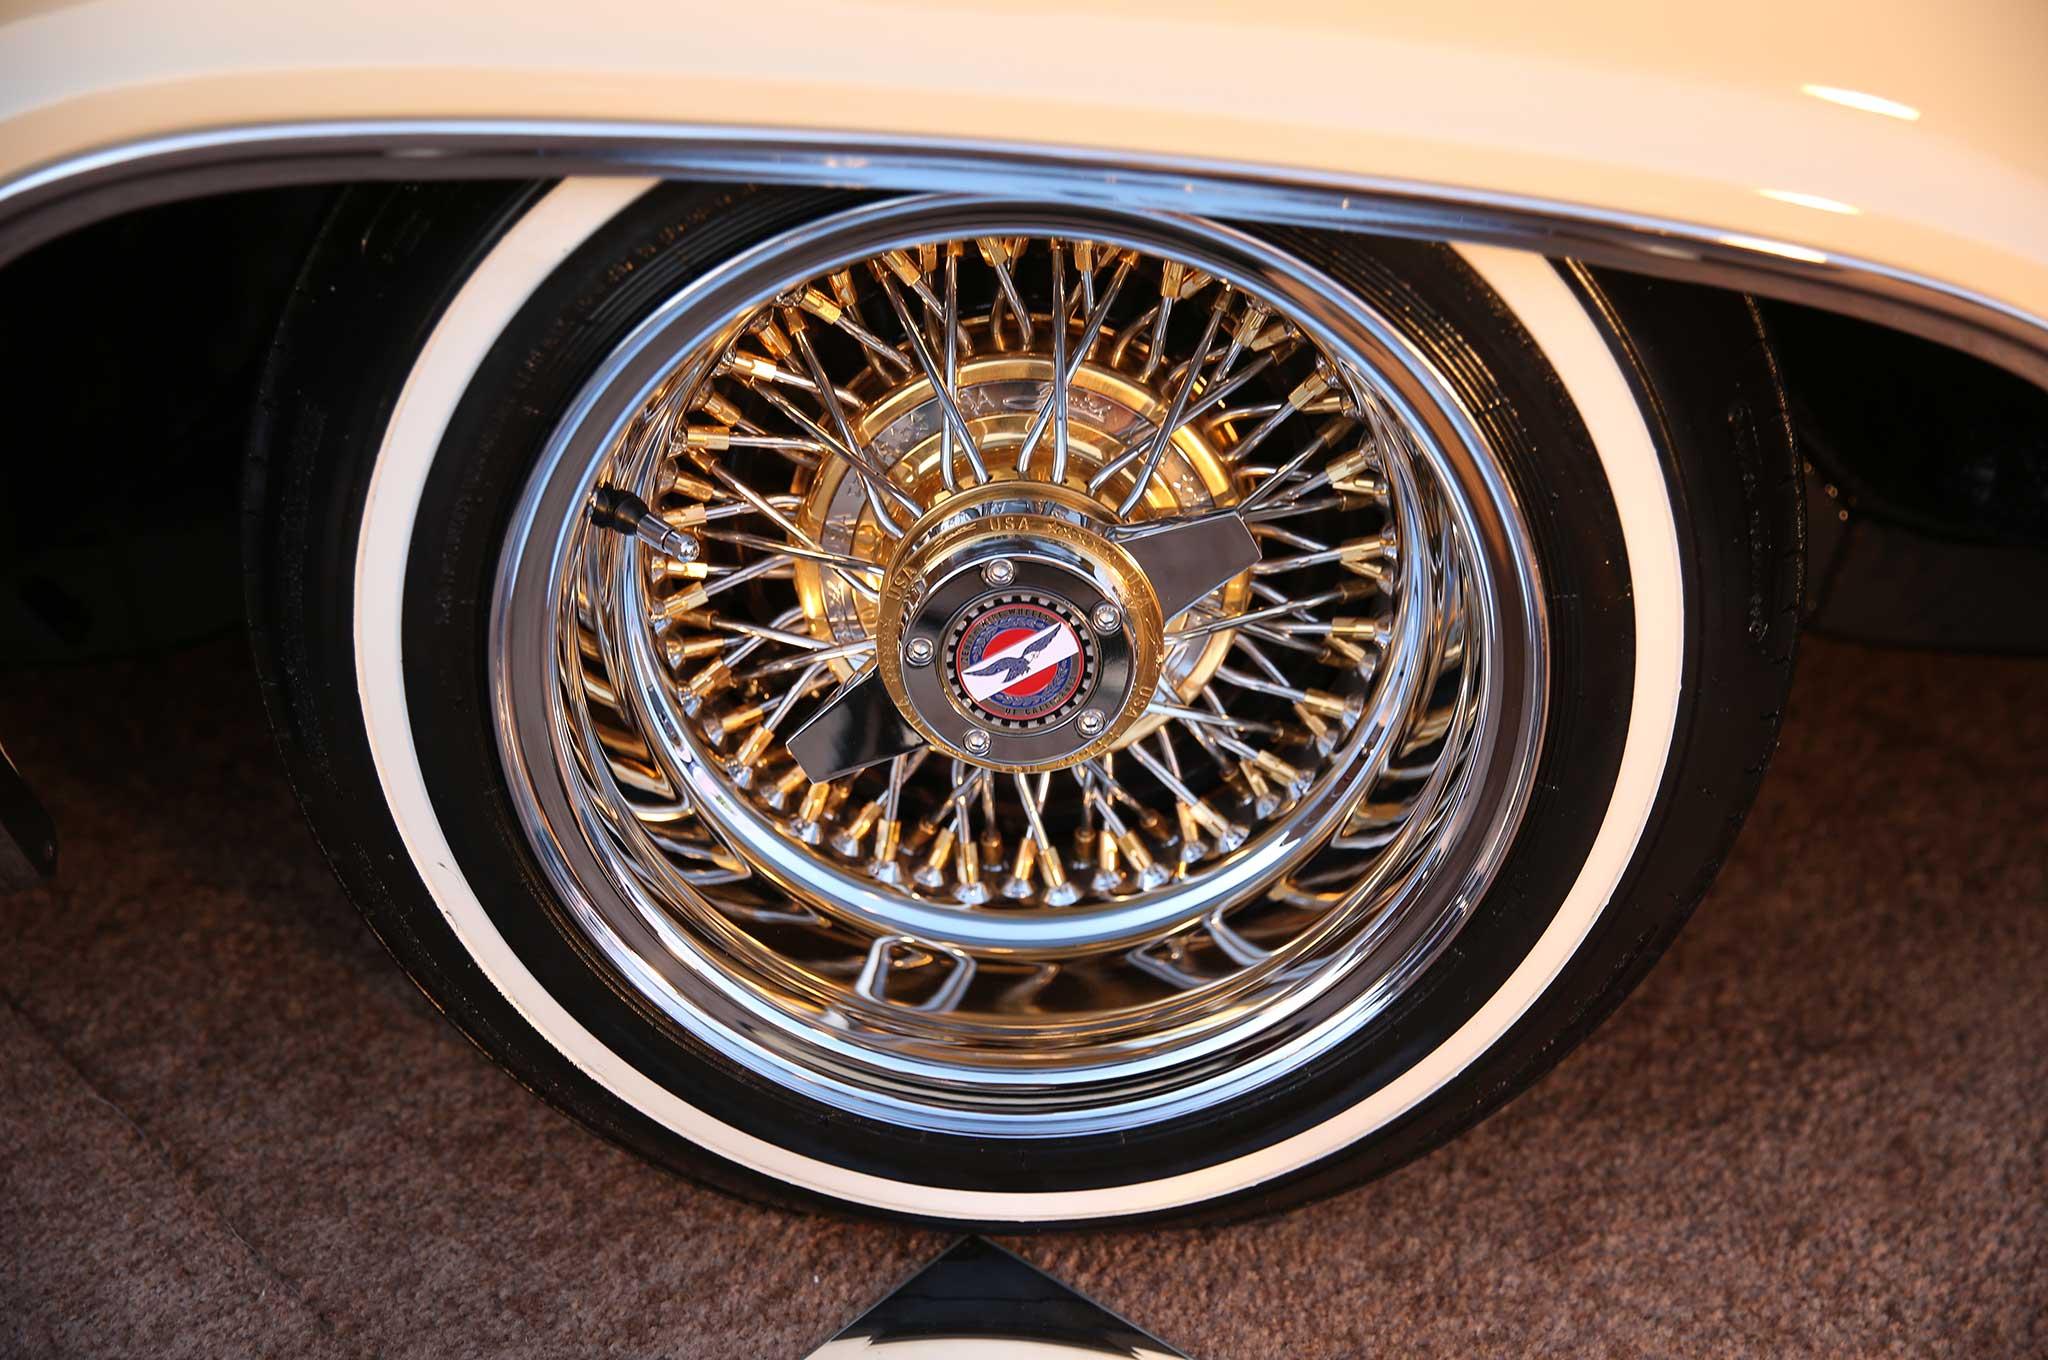 1965 chevrolet impala ss zenith wire wheel - Lowrider